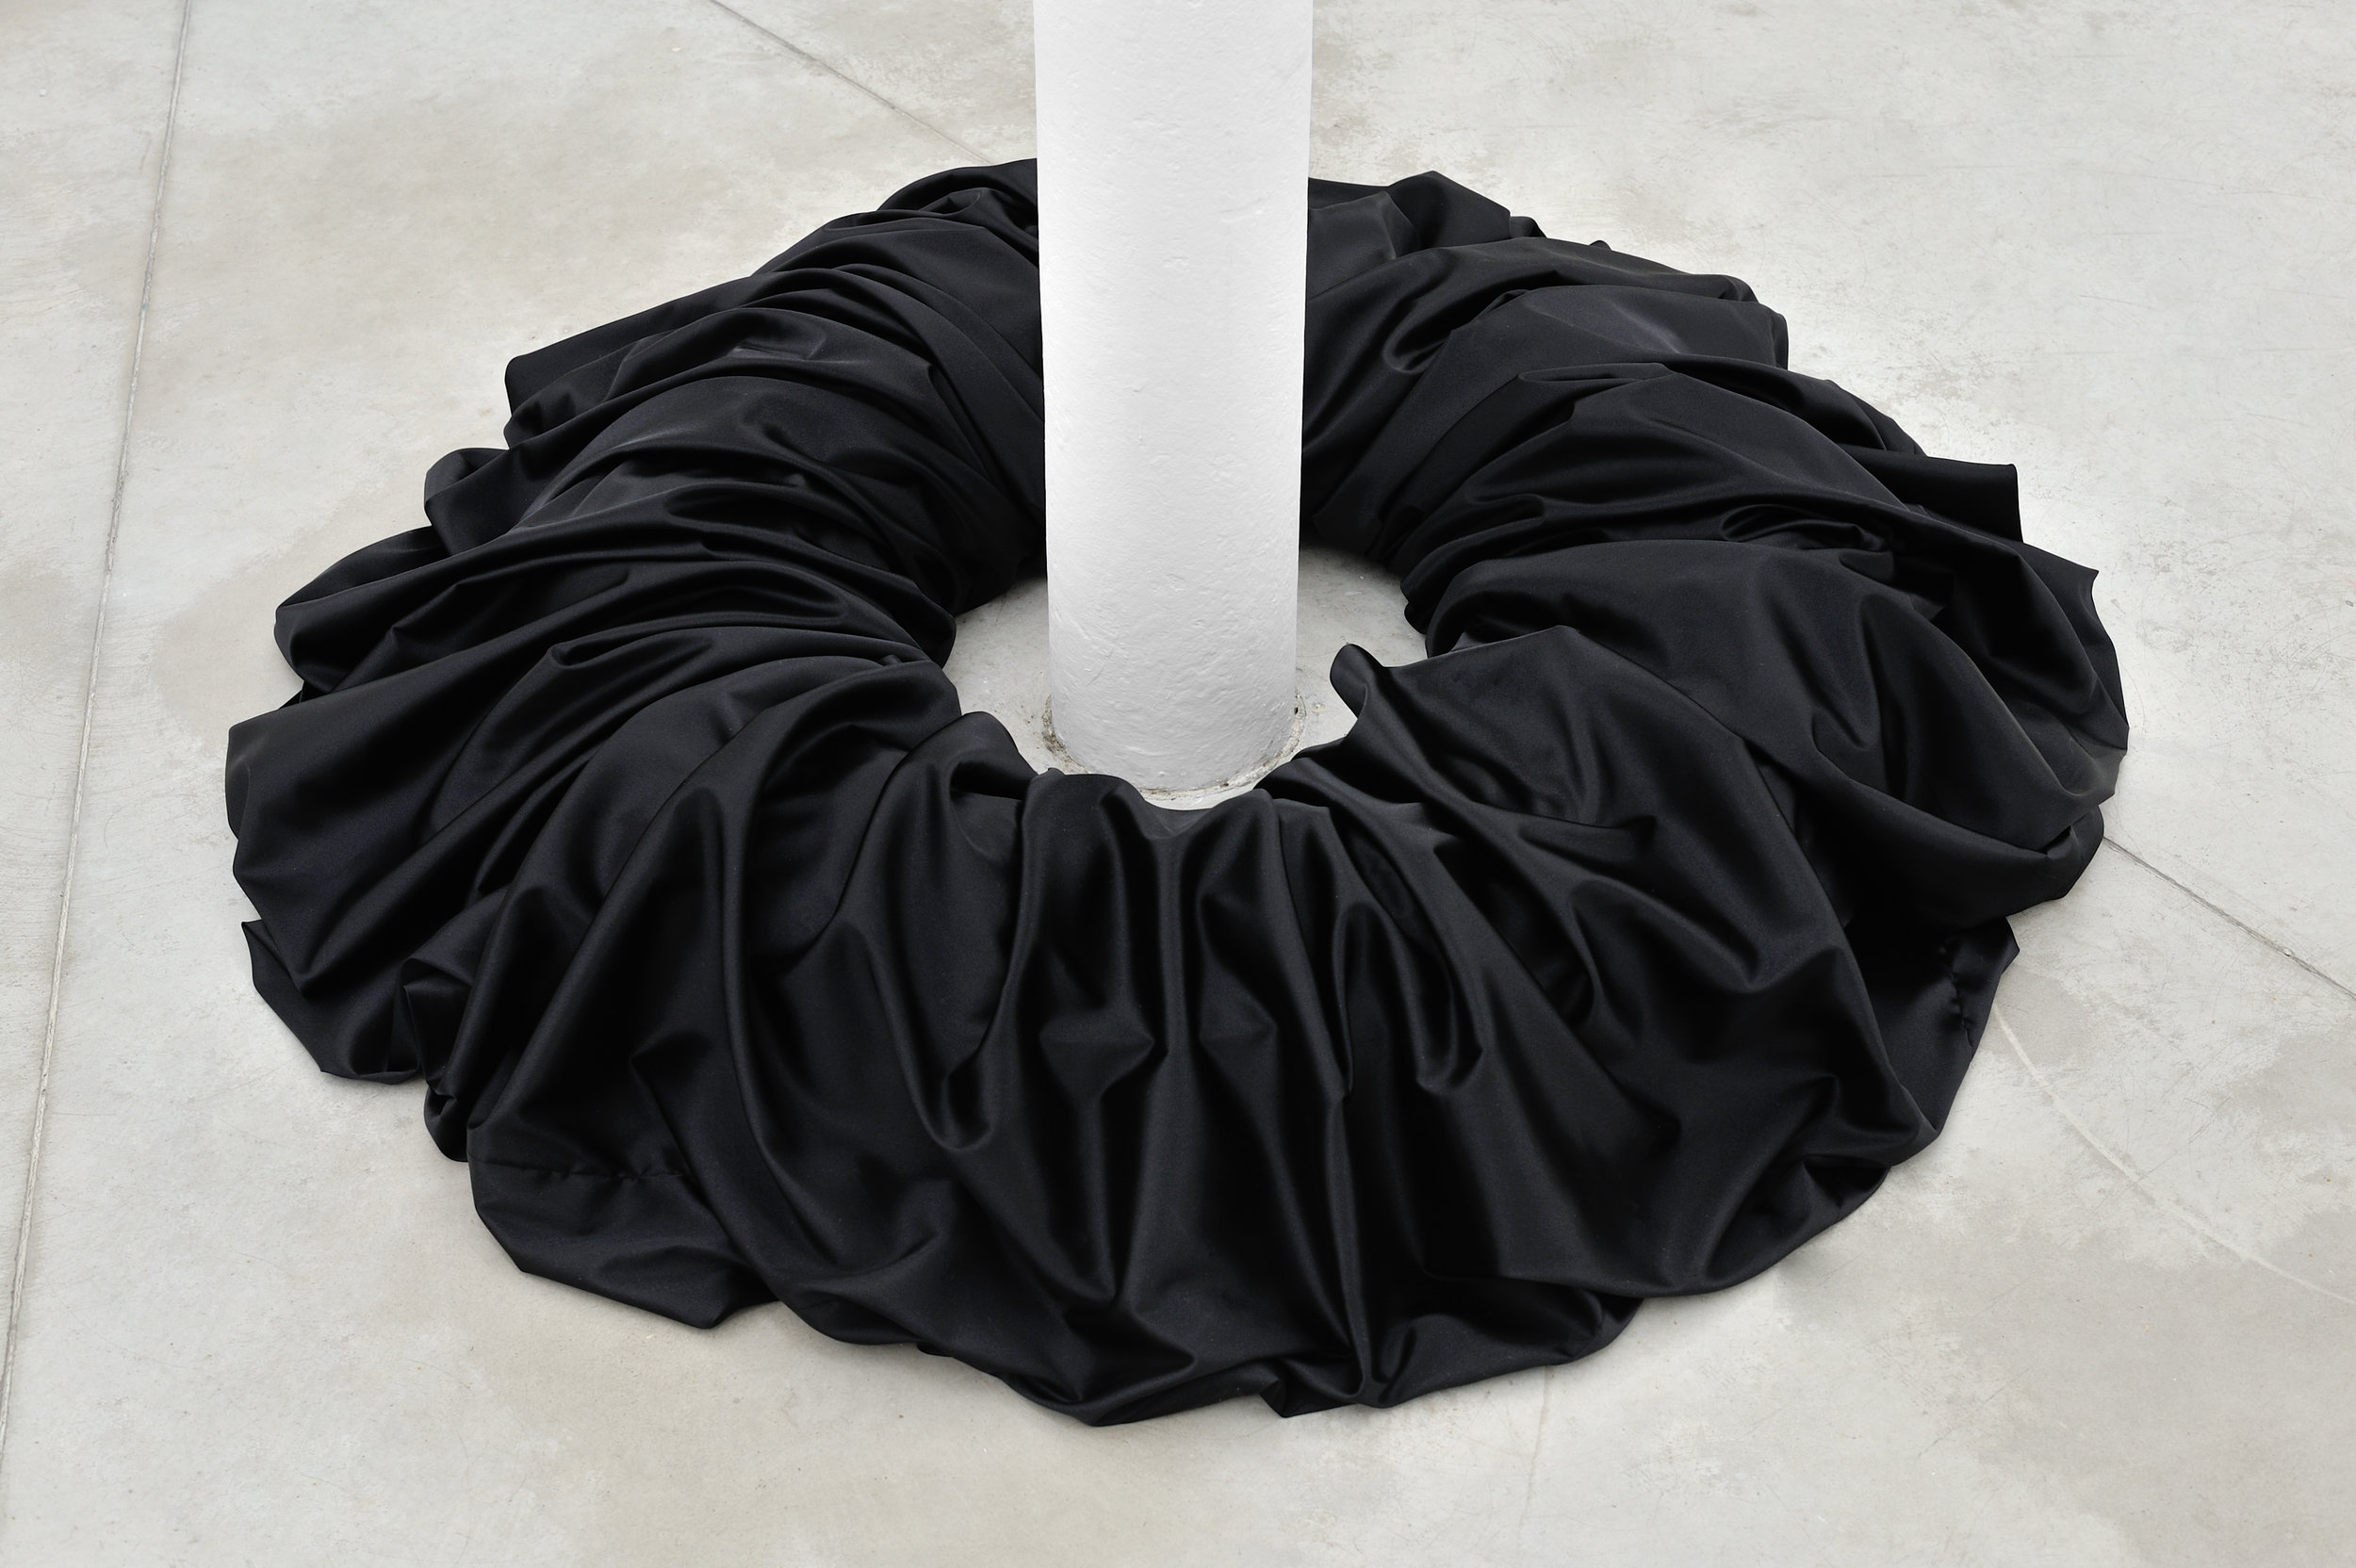 BLACK SCRUNCHIE (1258%), 2015 satin, elastic 49 x 49 x 30 cm - 19 1/4 x 19 1/4 x 11 3/4 inches